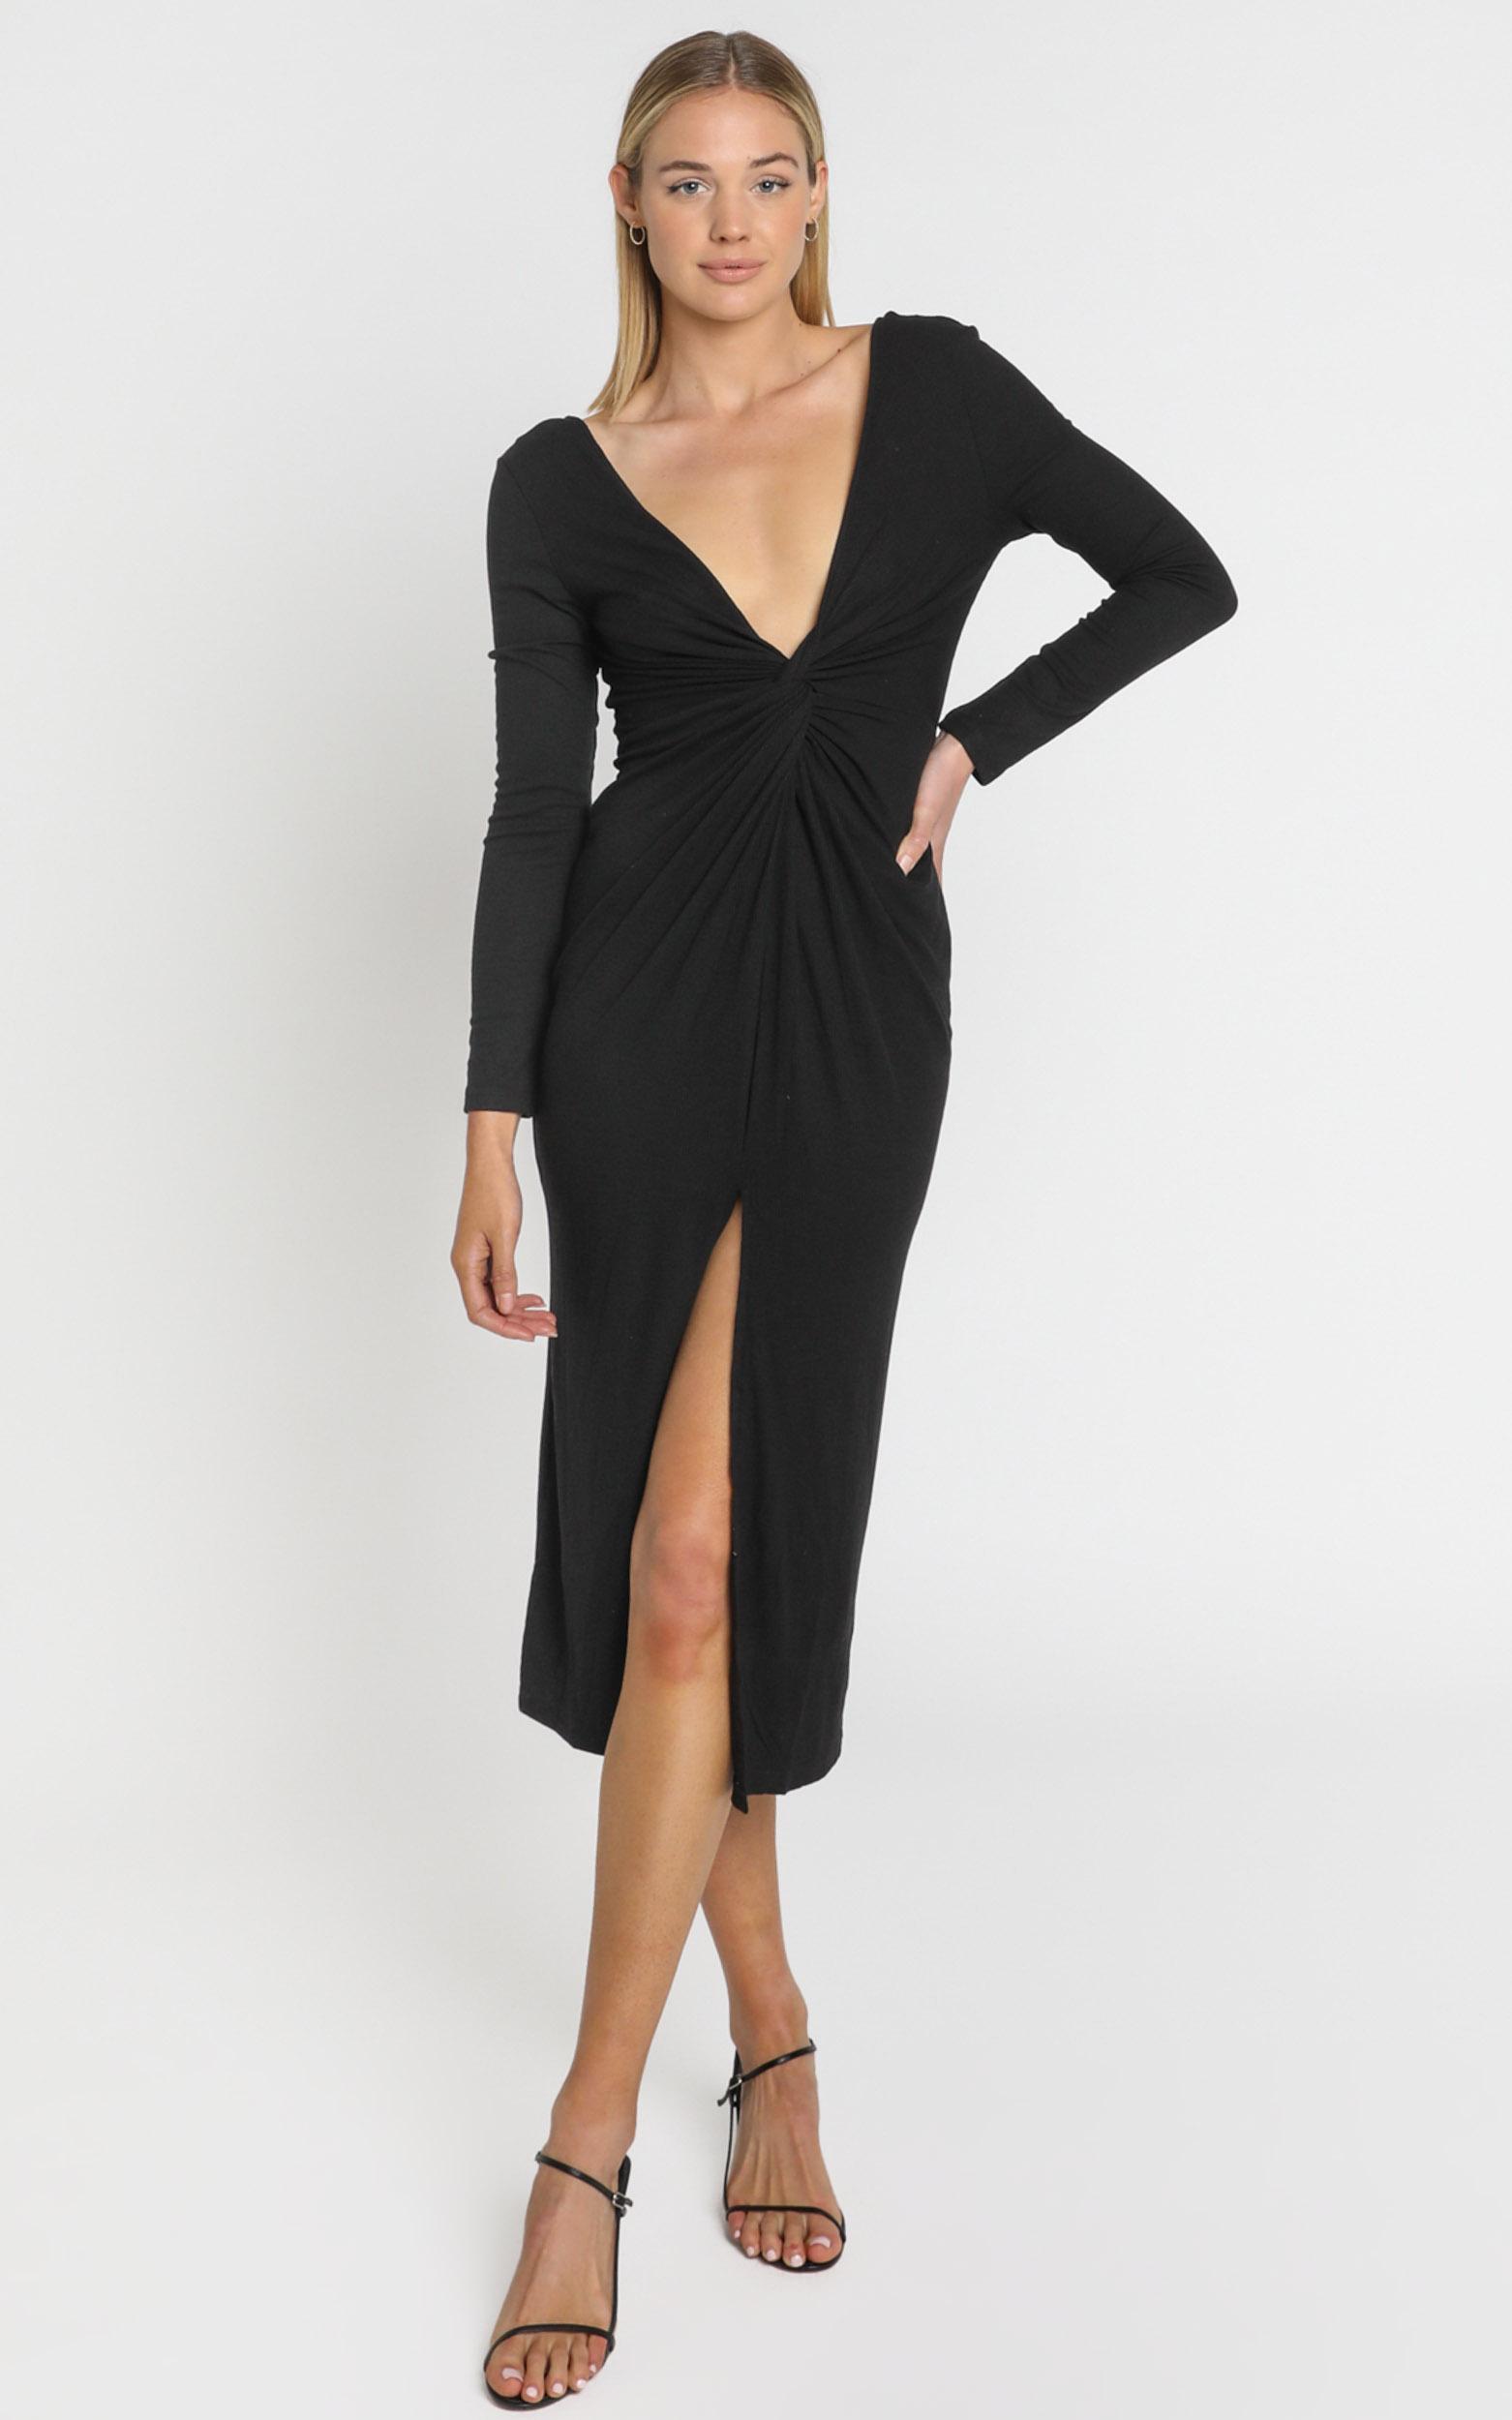 Prime Dress in black rib - 6 (XS), Black, hi-res image number null